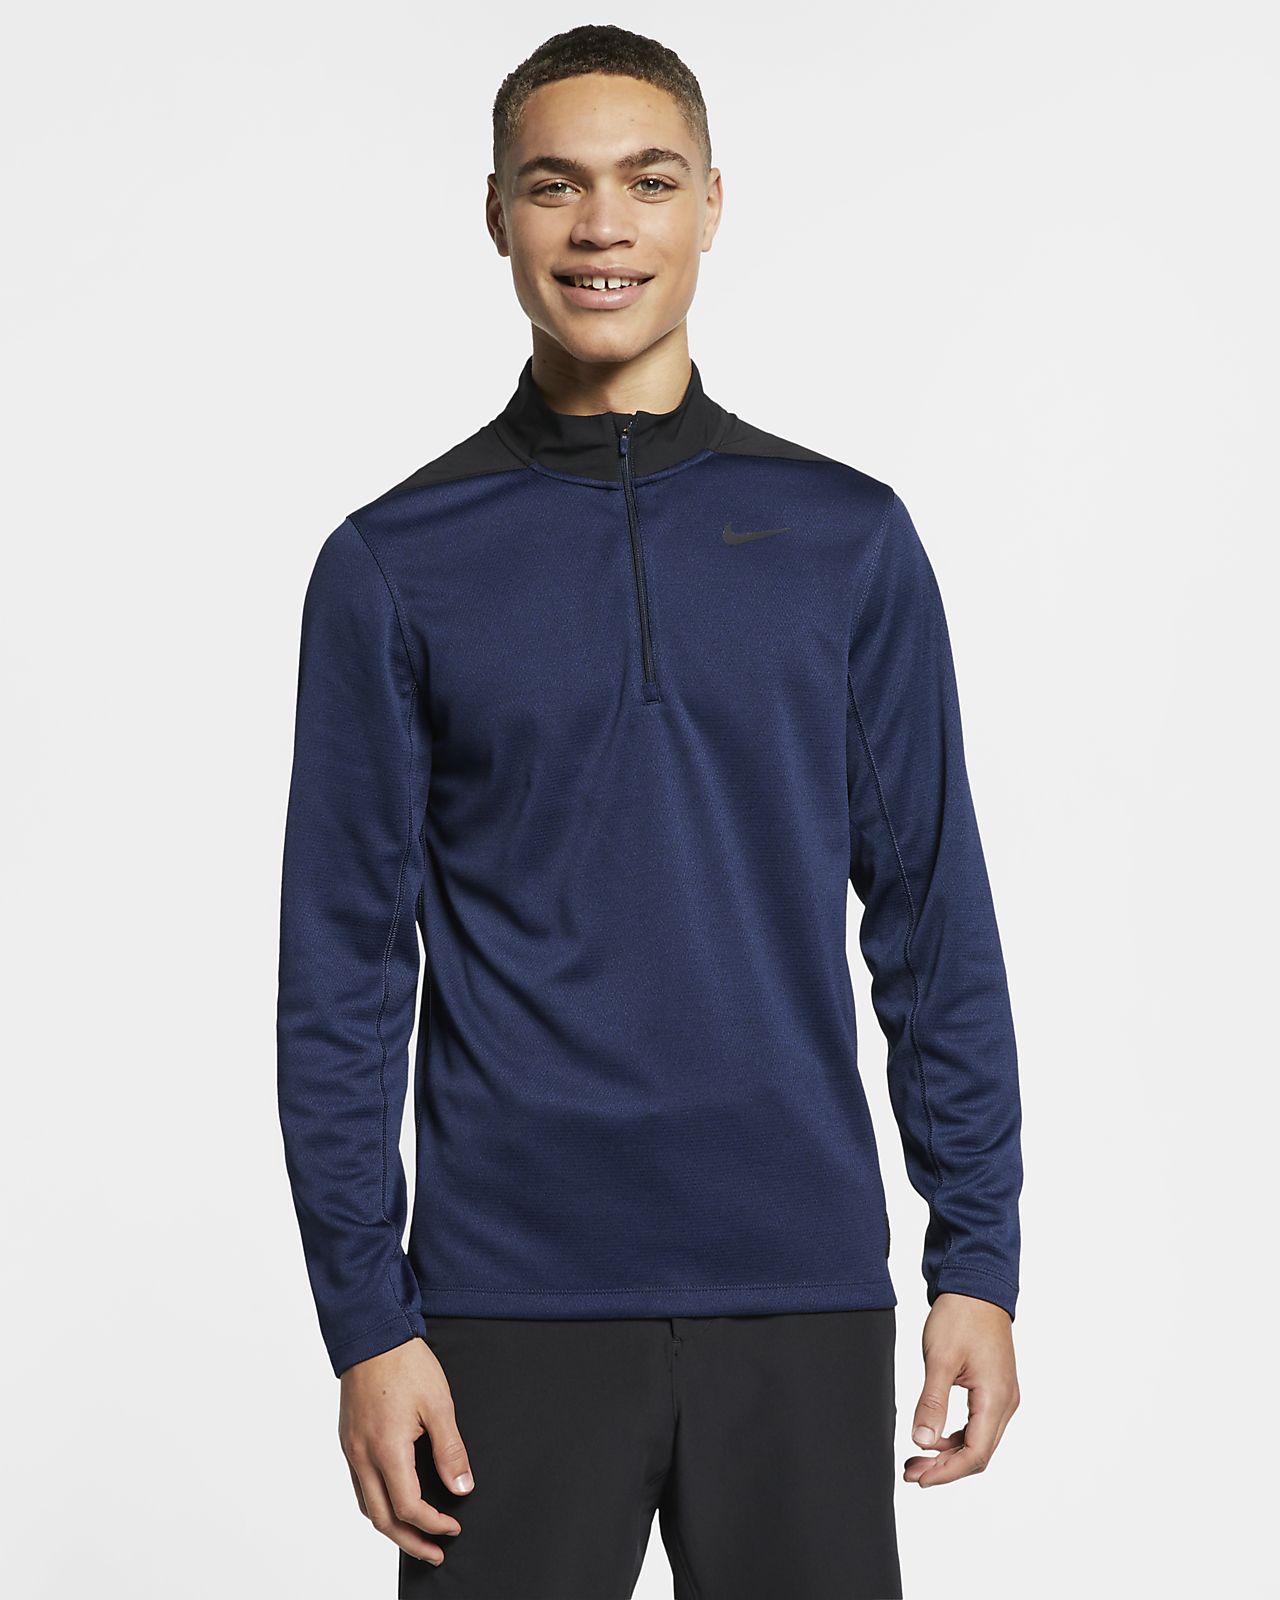 Nike Dri-FIT 1/2 golfoverdel med glidelås til herre